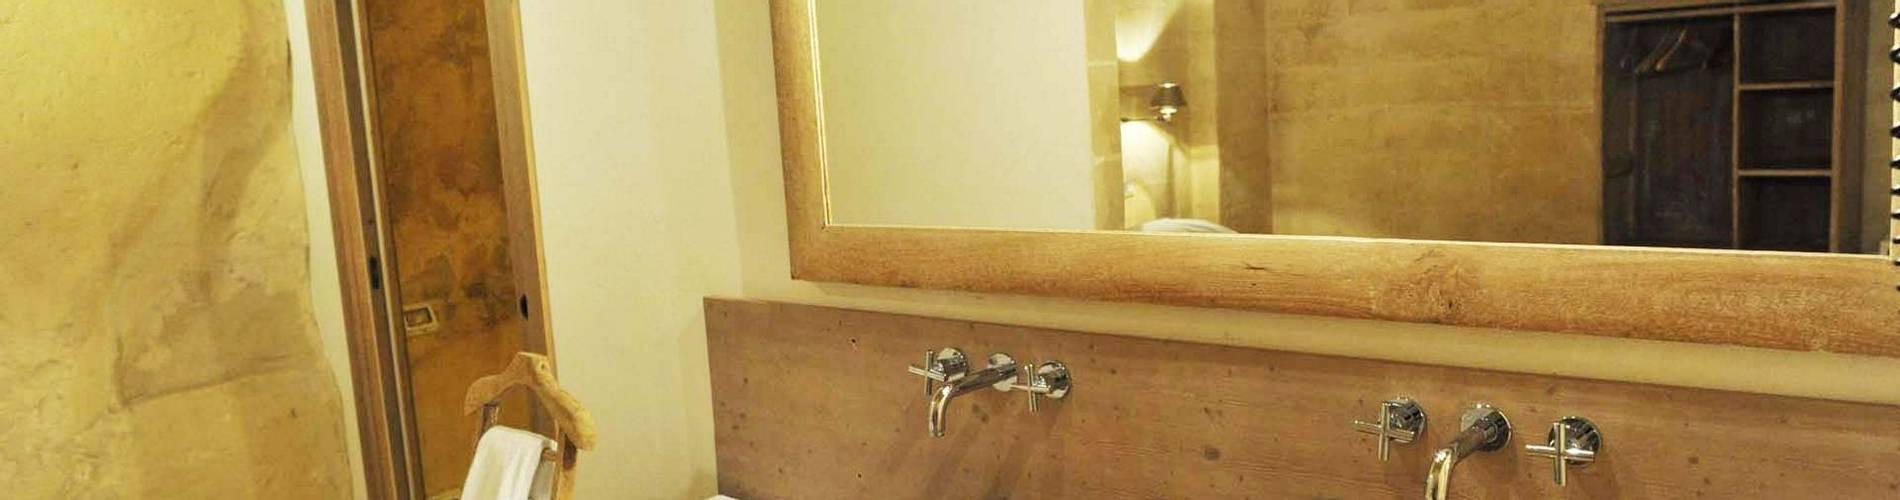 L'Hotel In Pietra, Basilicata, Italy, Deluxe Room 1005 (7).jpg